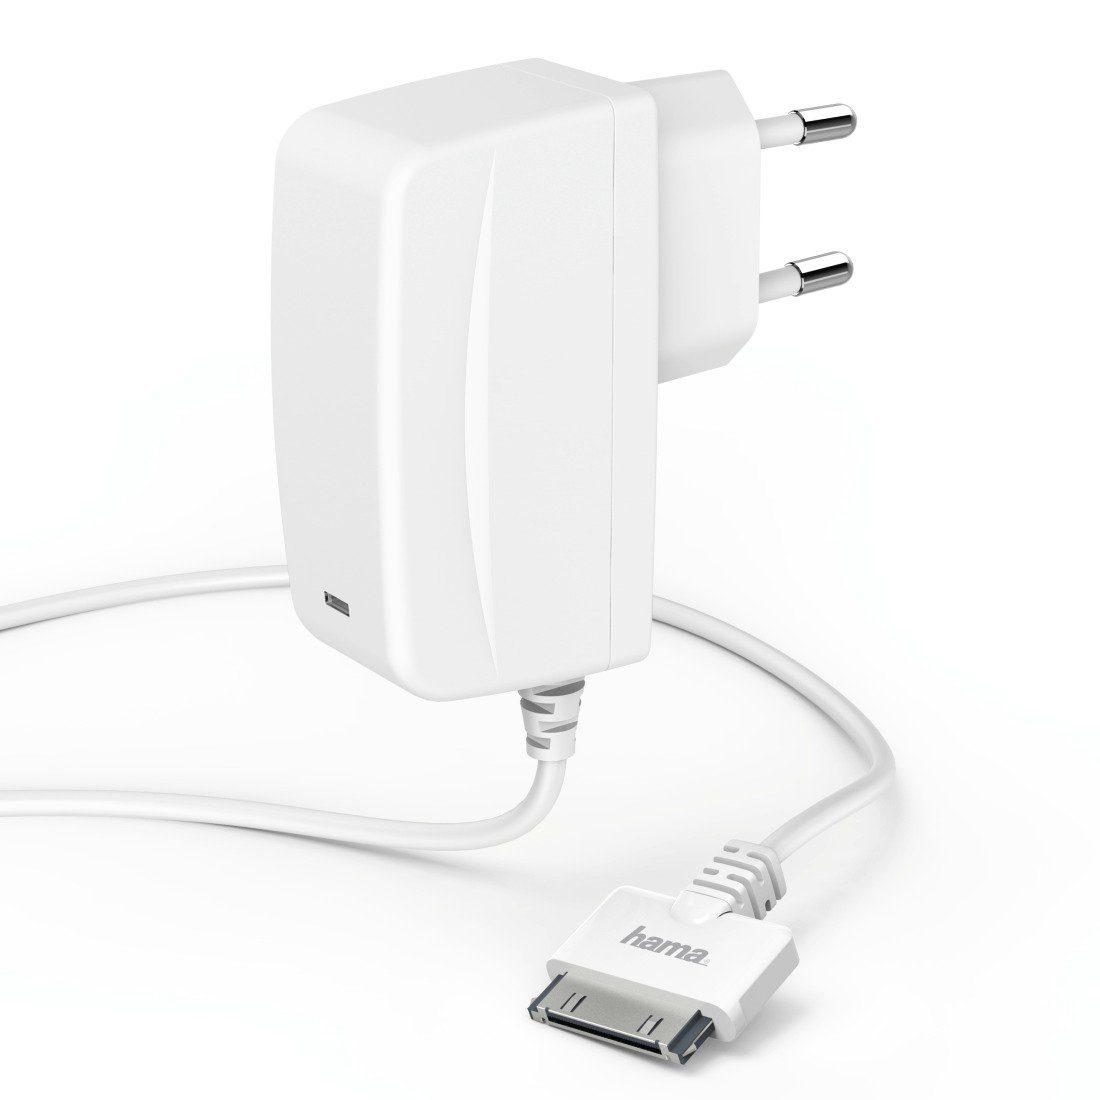 Hama Reiseladegerät für Apple iPhone 3G/3G S/4/4S und iPod, MFI